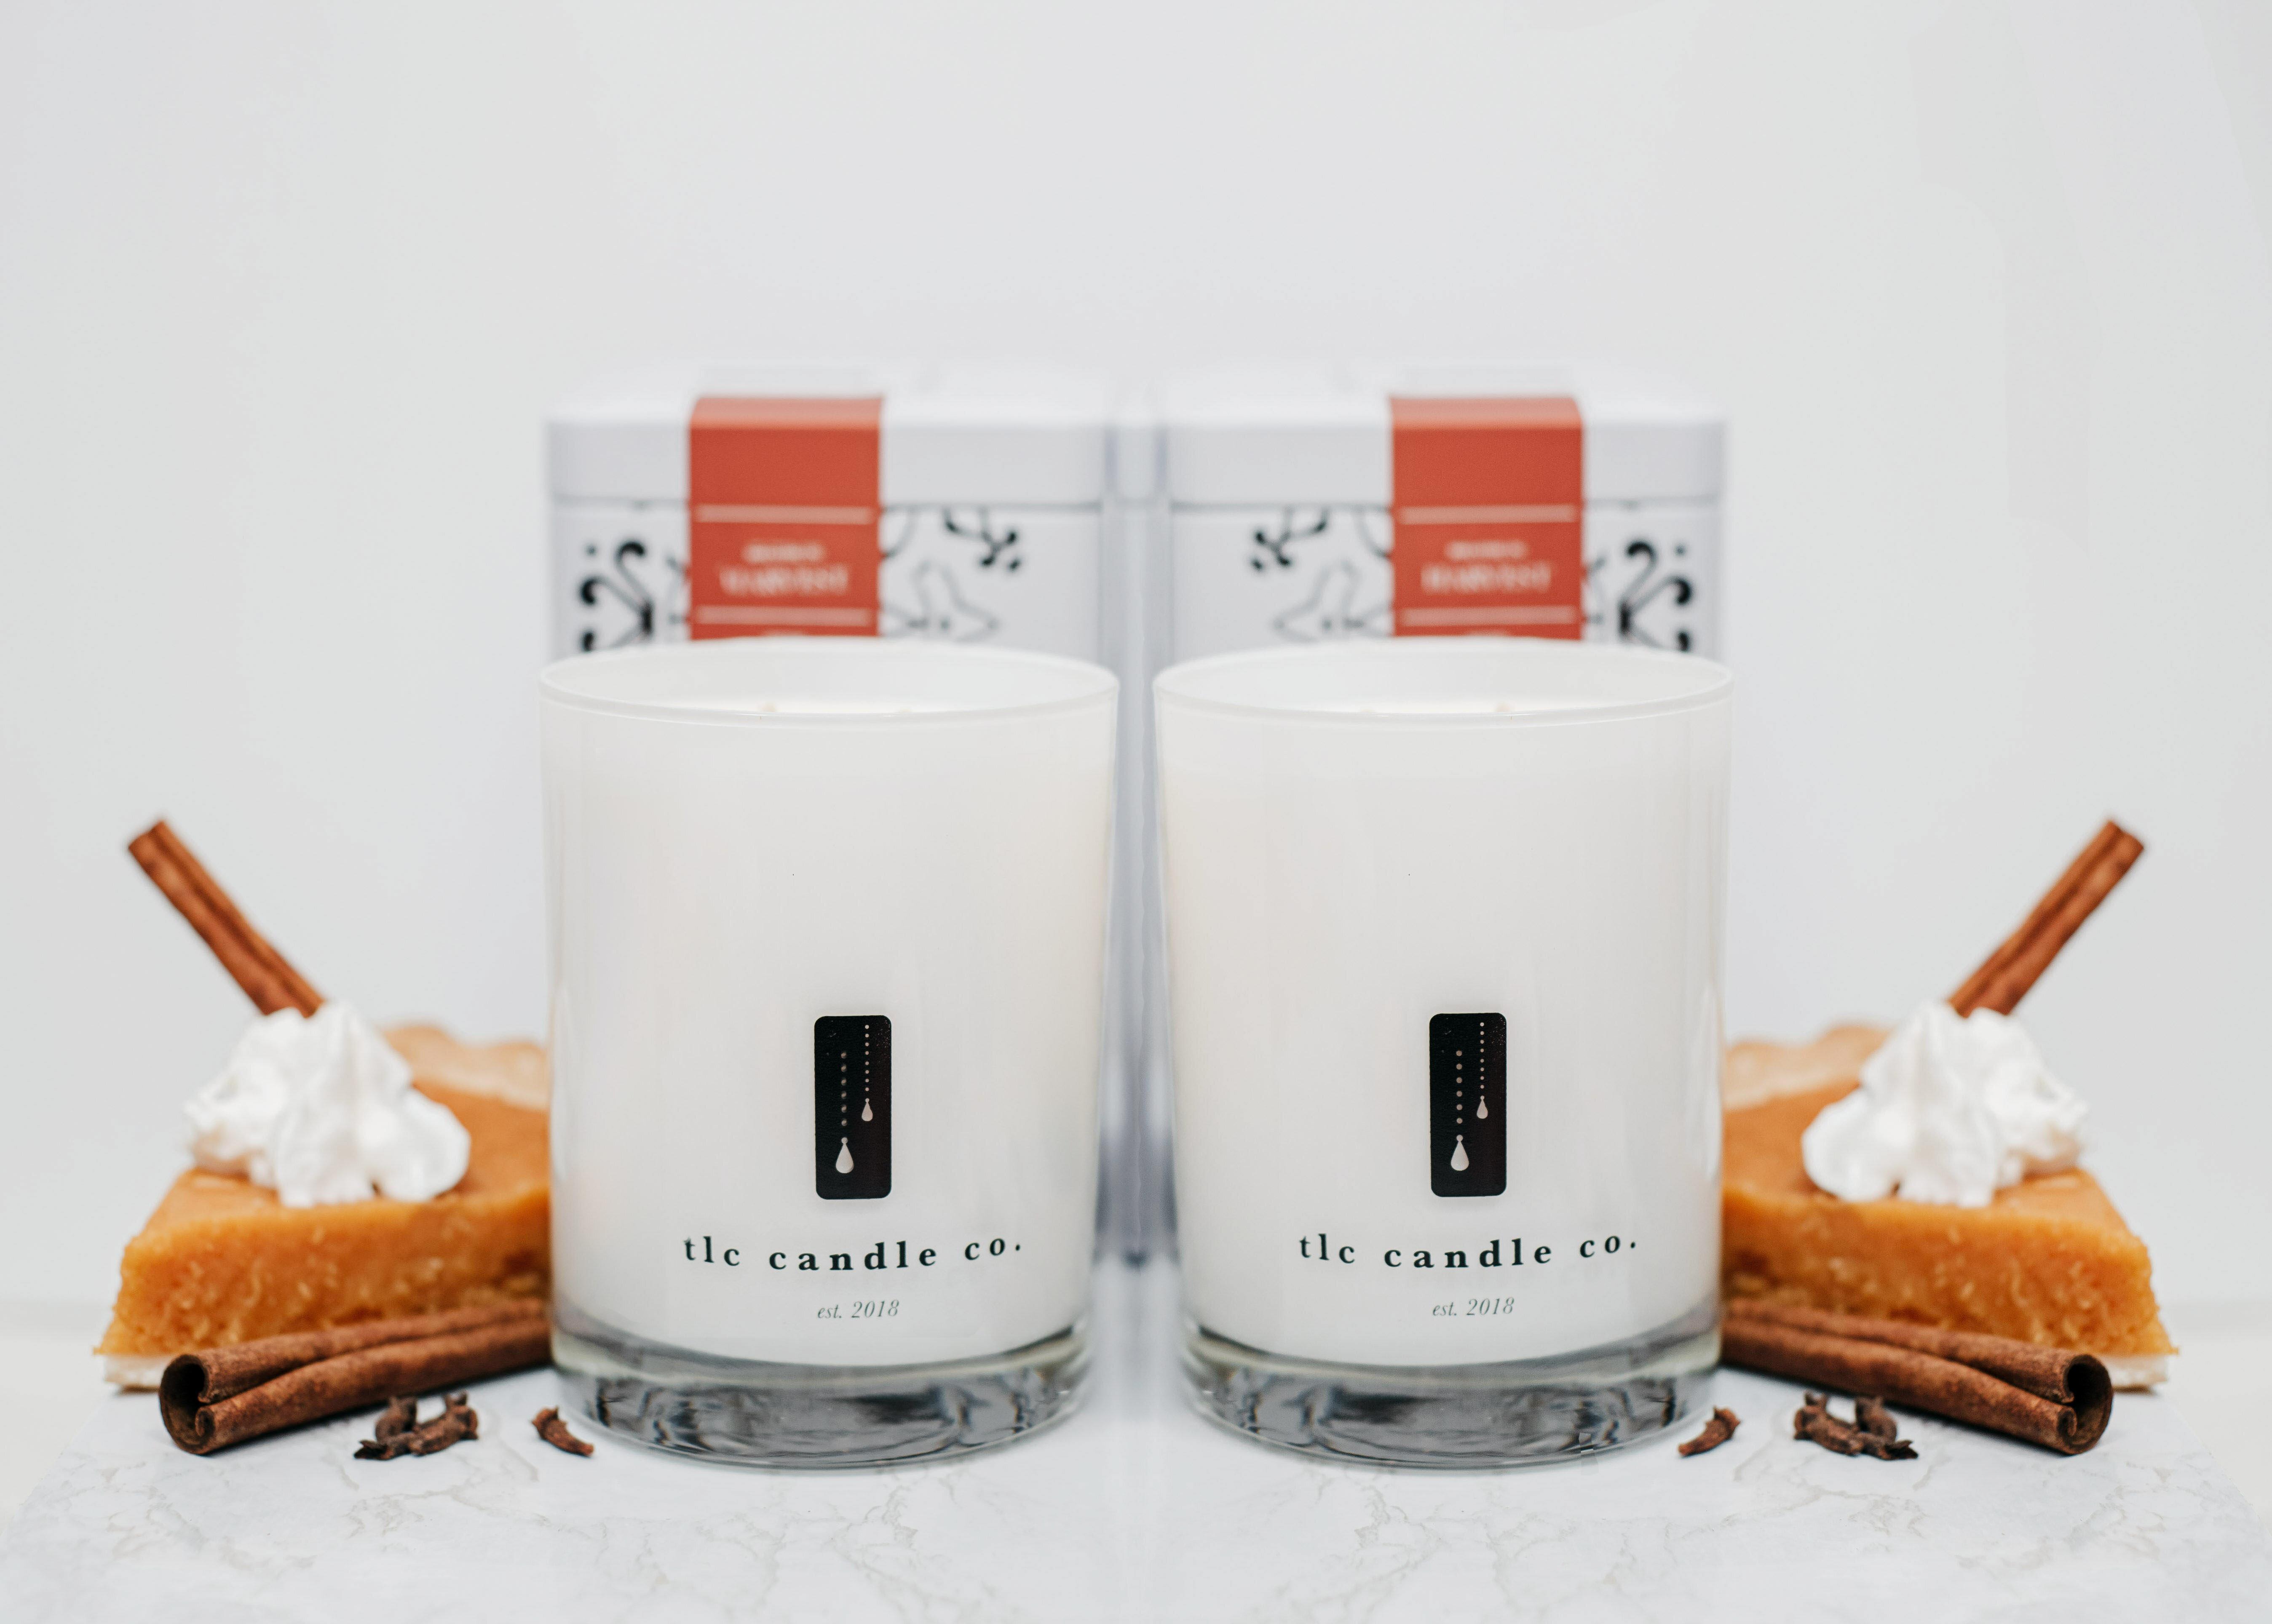 Tlc Candle Co 2 Piece Harvest Scented Jar Candle Set Wayfair